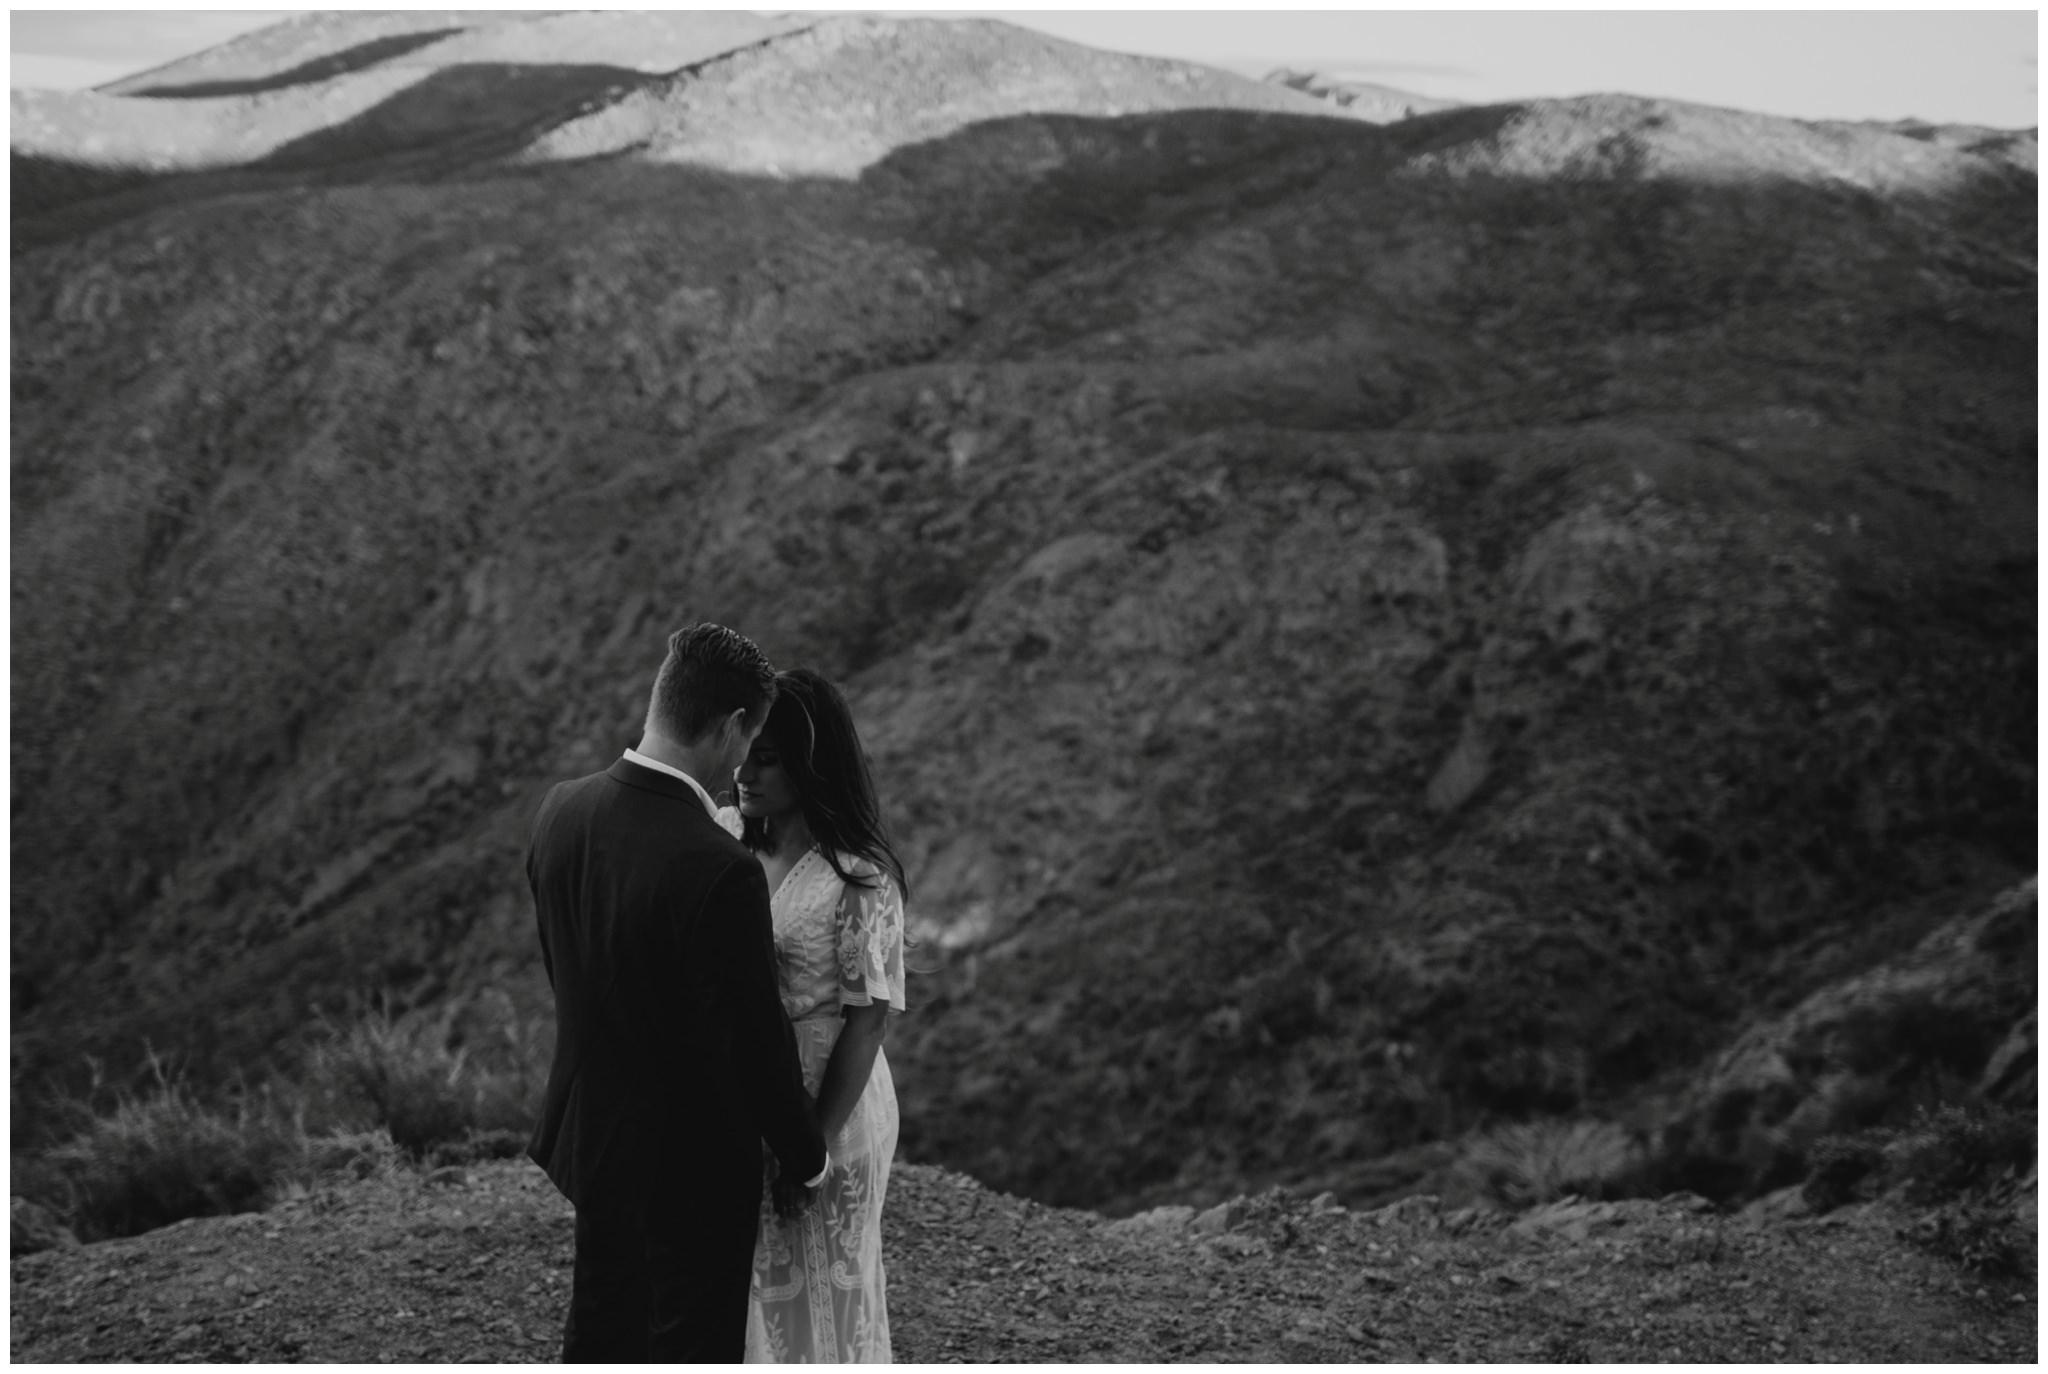 Mount_Laguna_Engagement_The_Singlers_0043.jpg